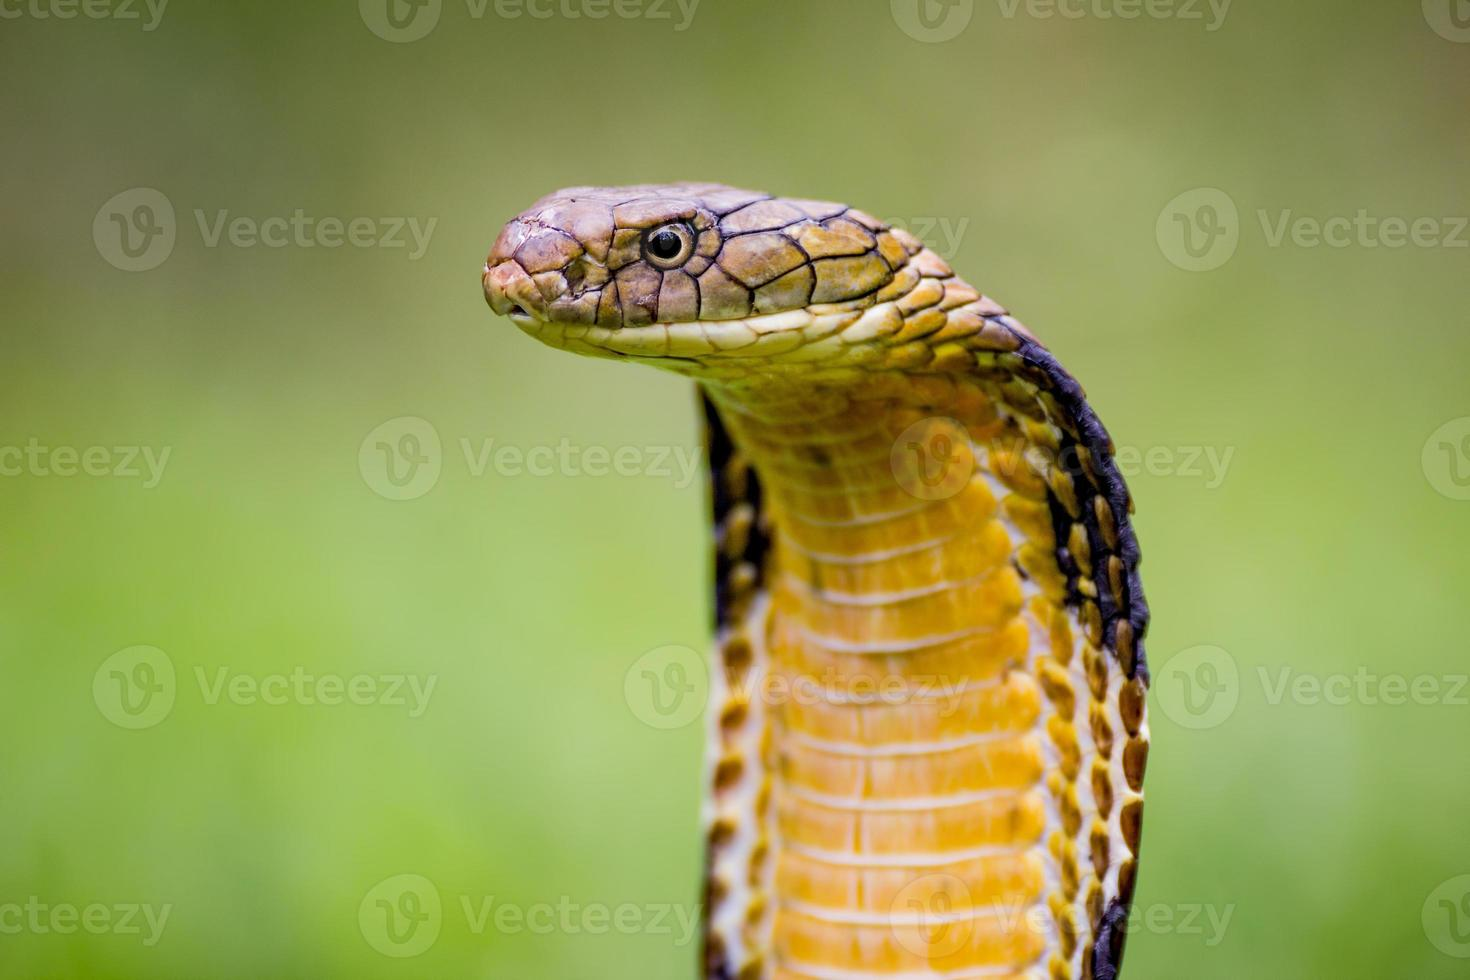 King Cobra (Ophiophagus hannah) The world's longest venomous snake photo